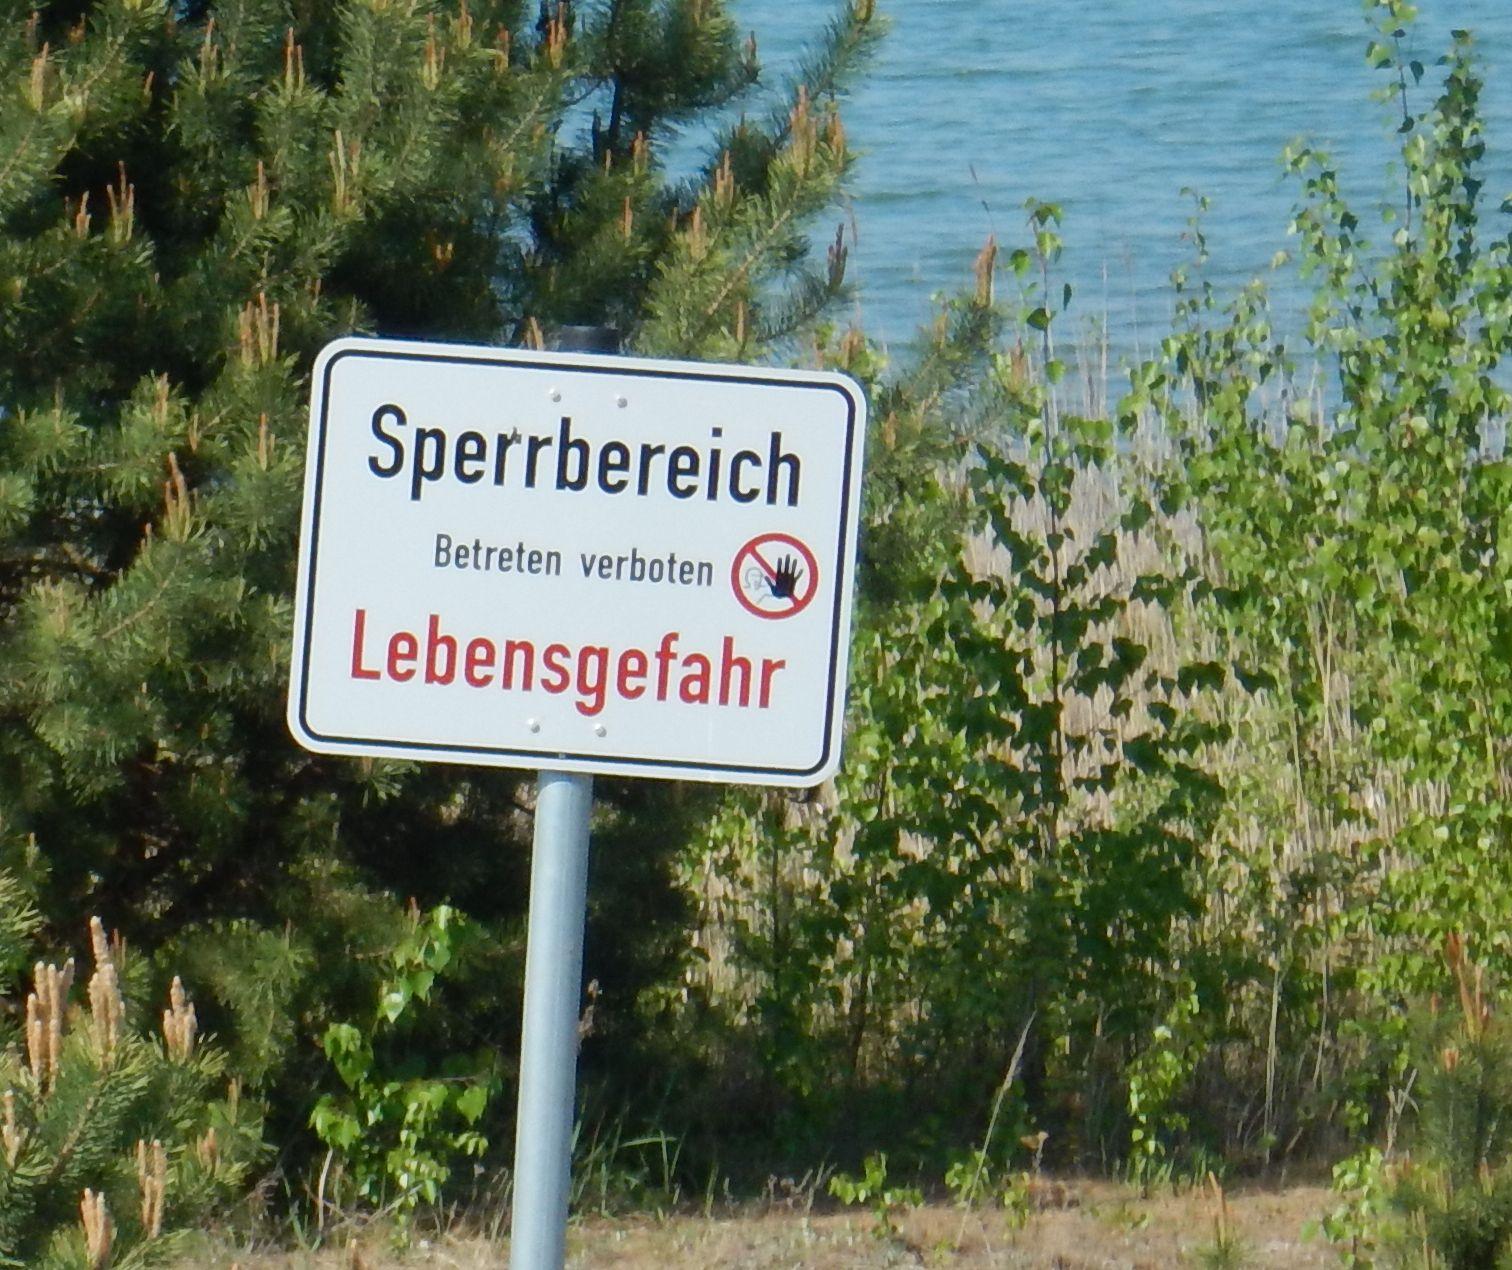 Sperrbereich.jpg